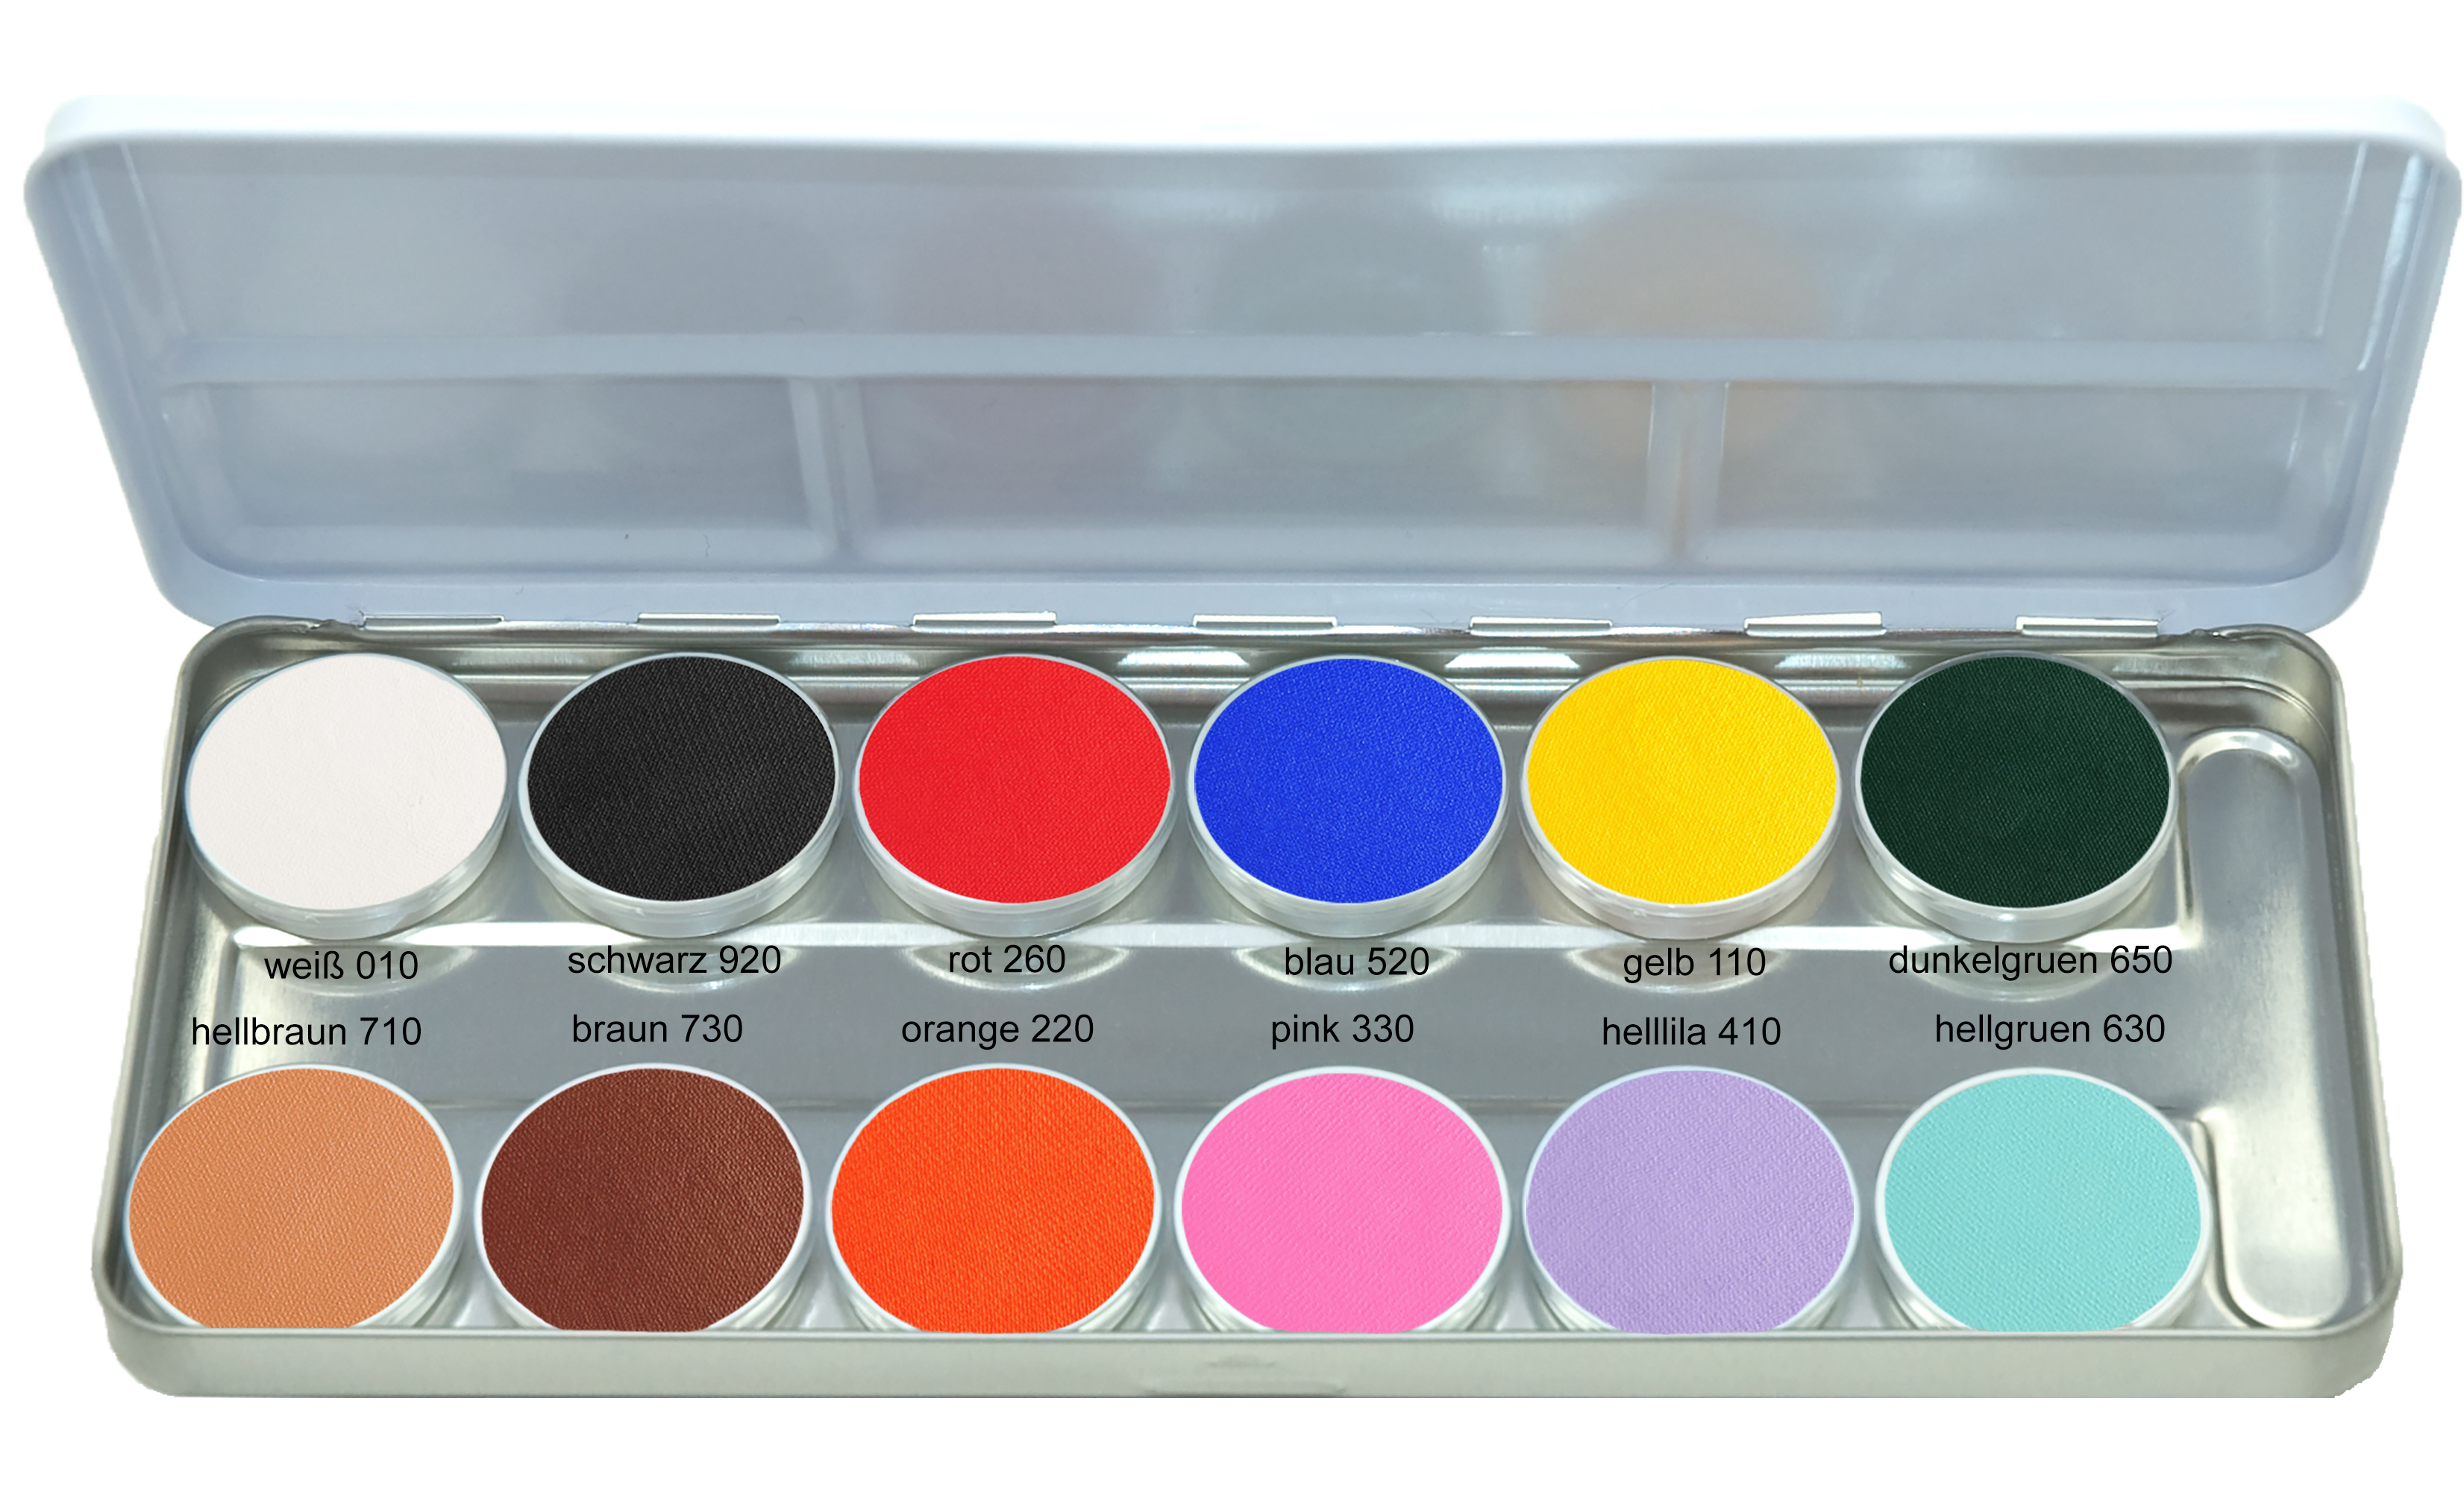 Mascerade AquaSuperPaint Schminkpalette Sortierung-1 mit 12 Farben